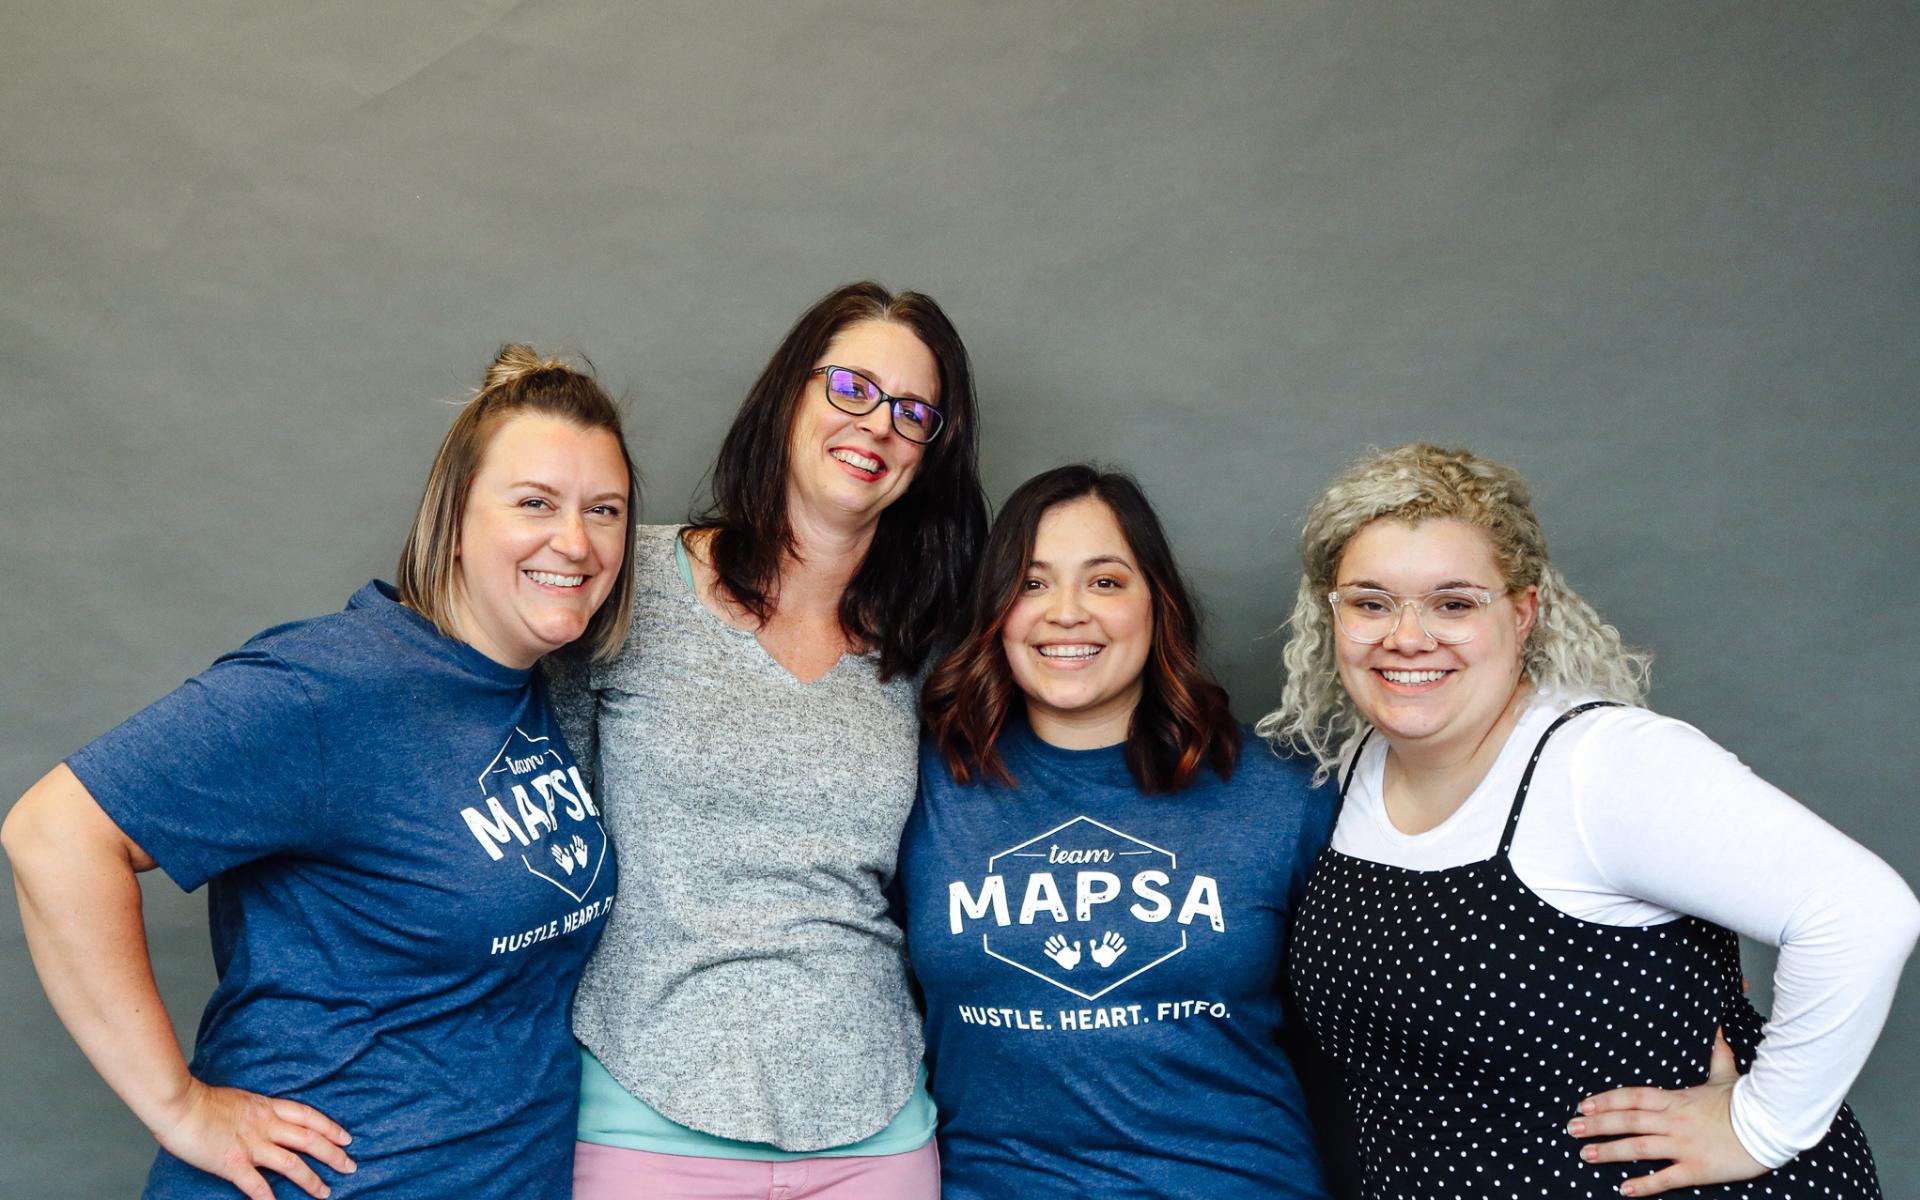 A photo of MAPSA team members Becky Carlton, Heather Risner, Grace Noyola and Vaughn Springer.